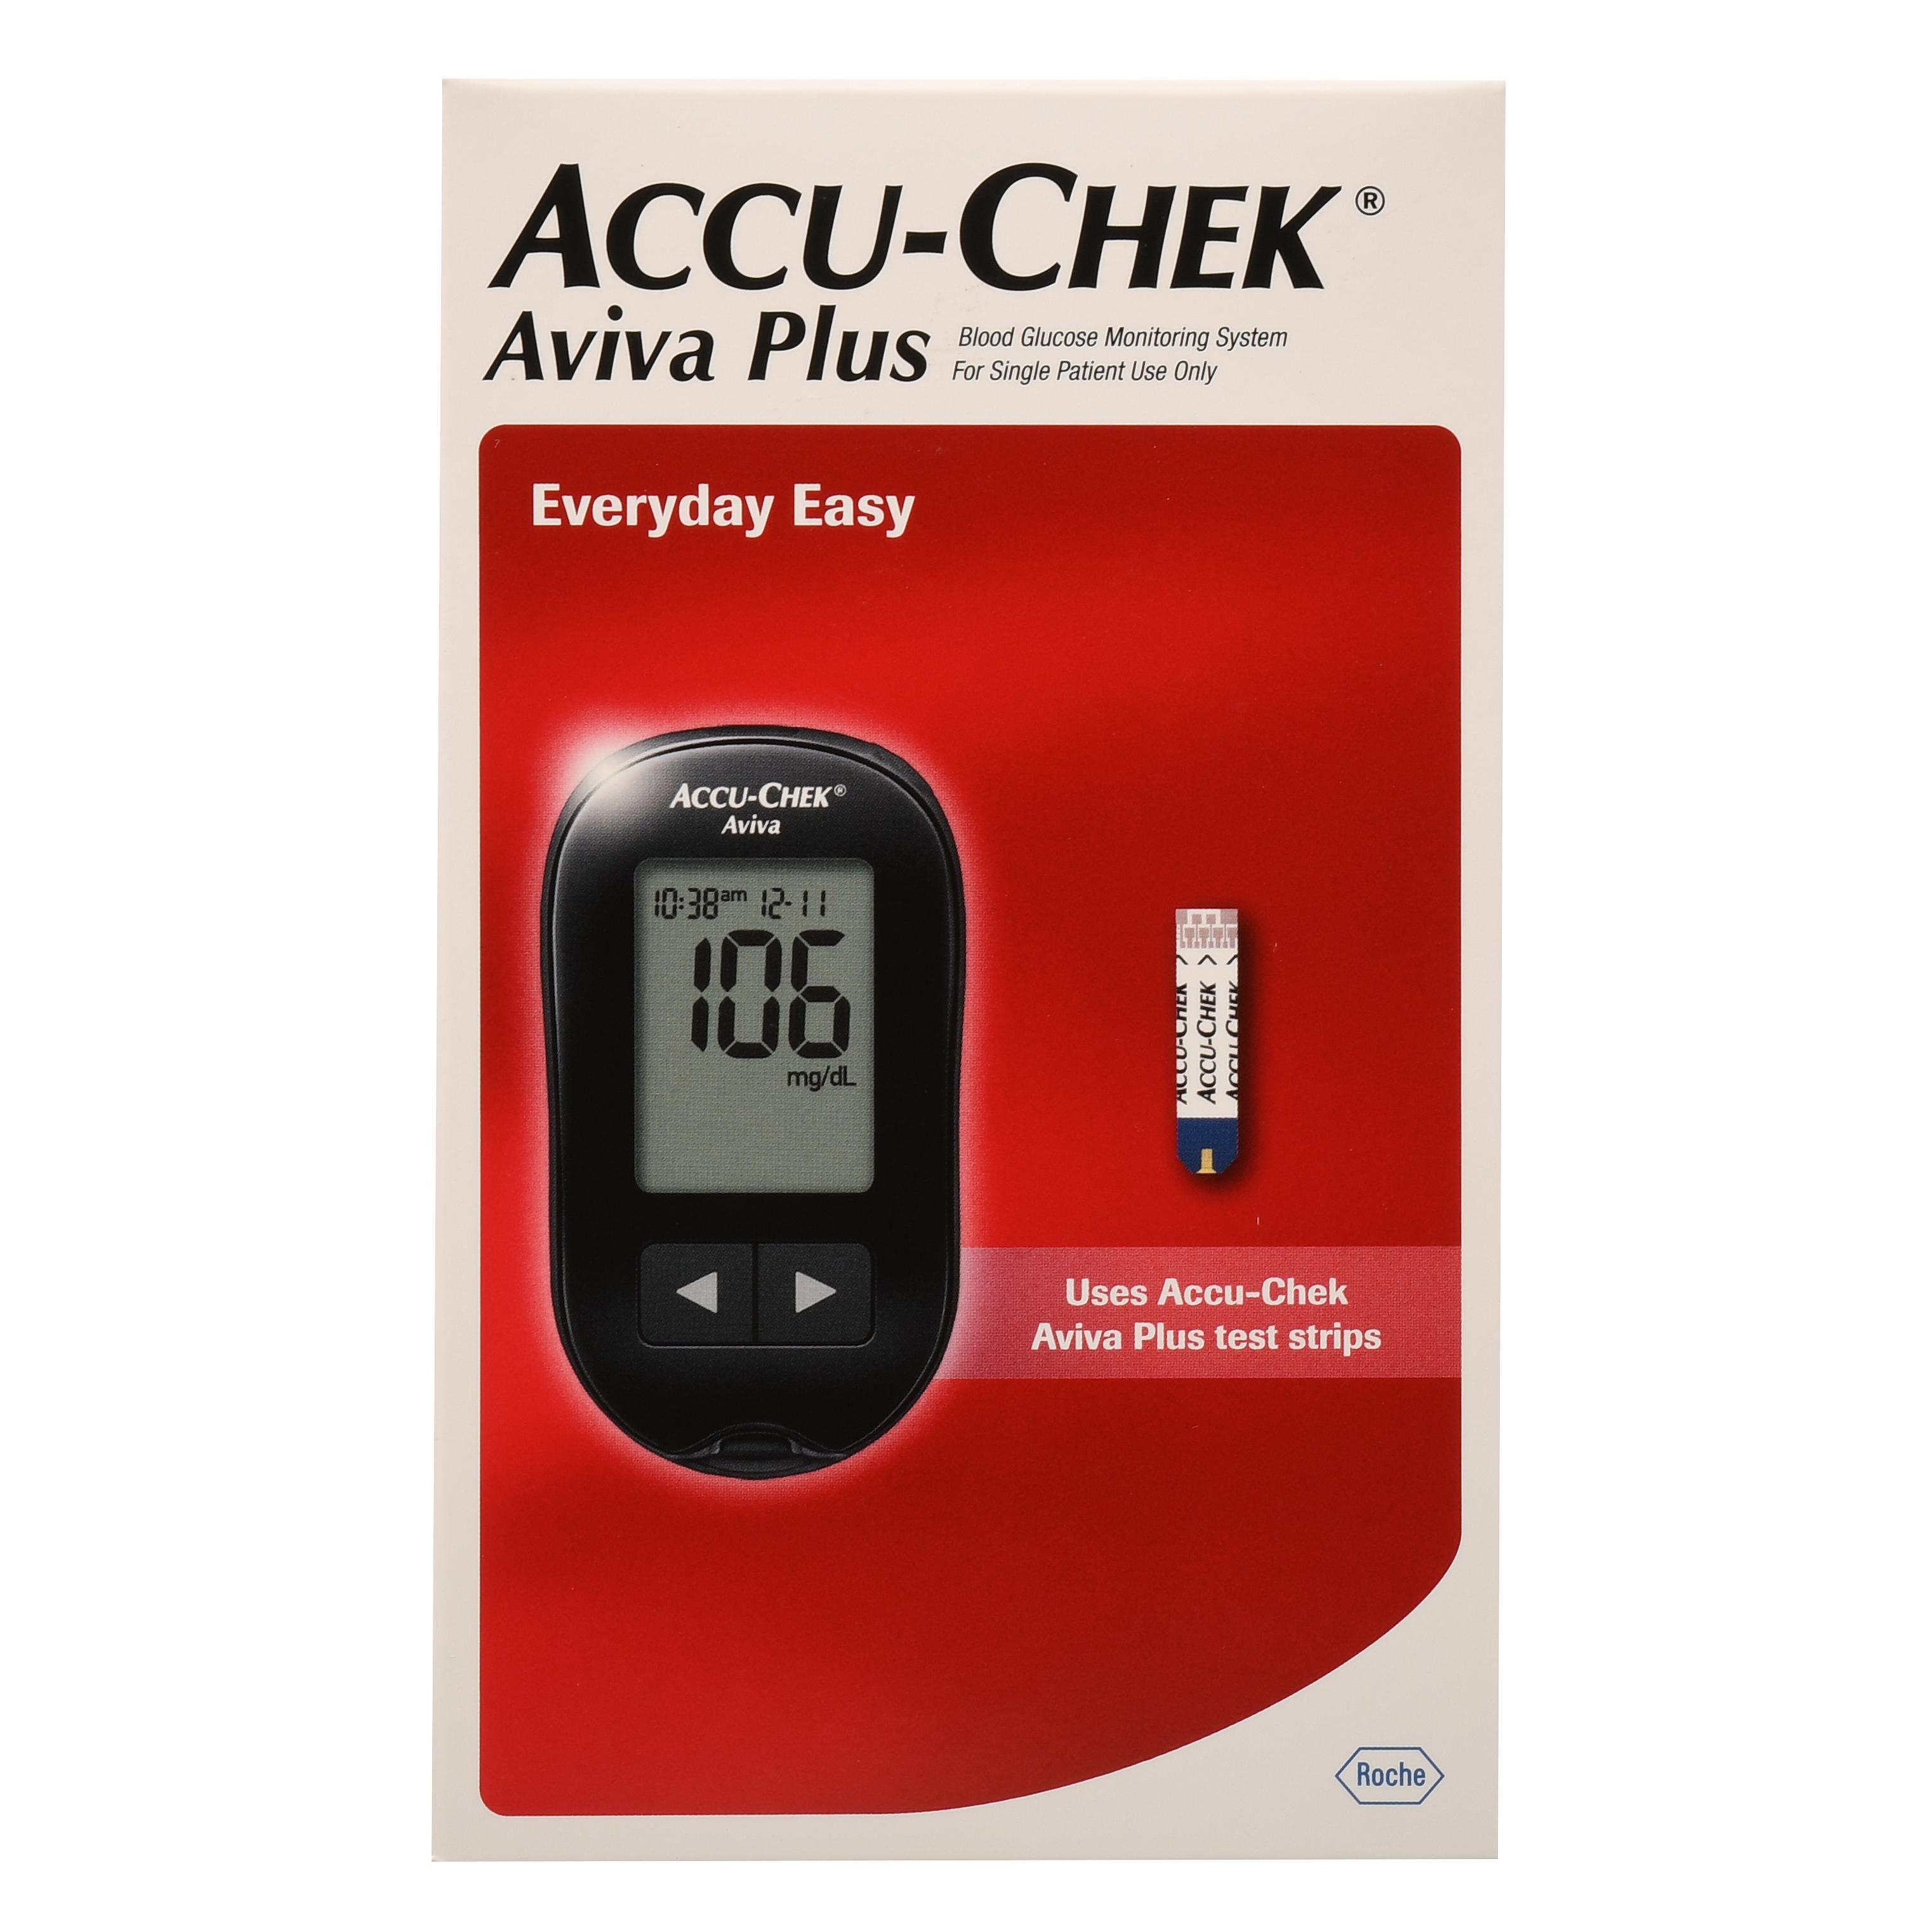 Accu-Chek Aviva Plus Blood Glucose Monitoring System Kit